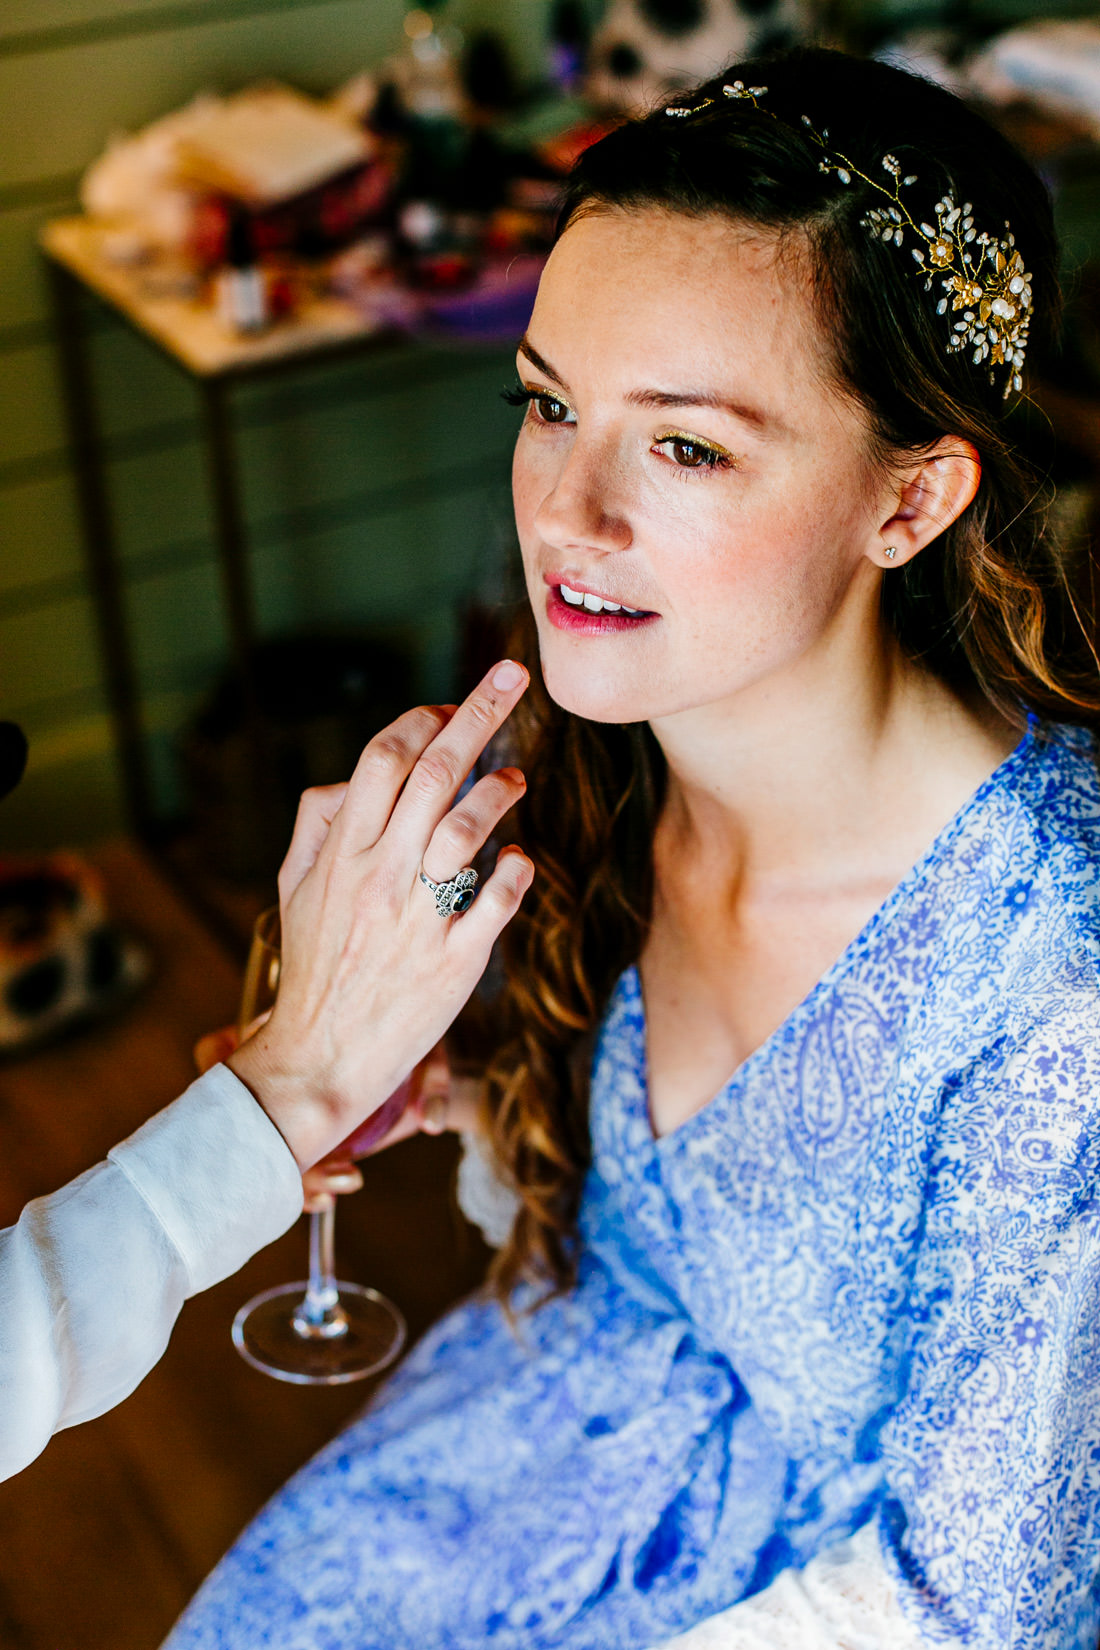 Whitsable-East-Quay-wedding-kent-photographer-Epic-Love-Story-013